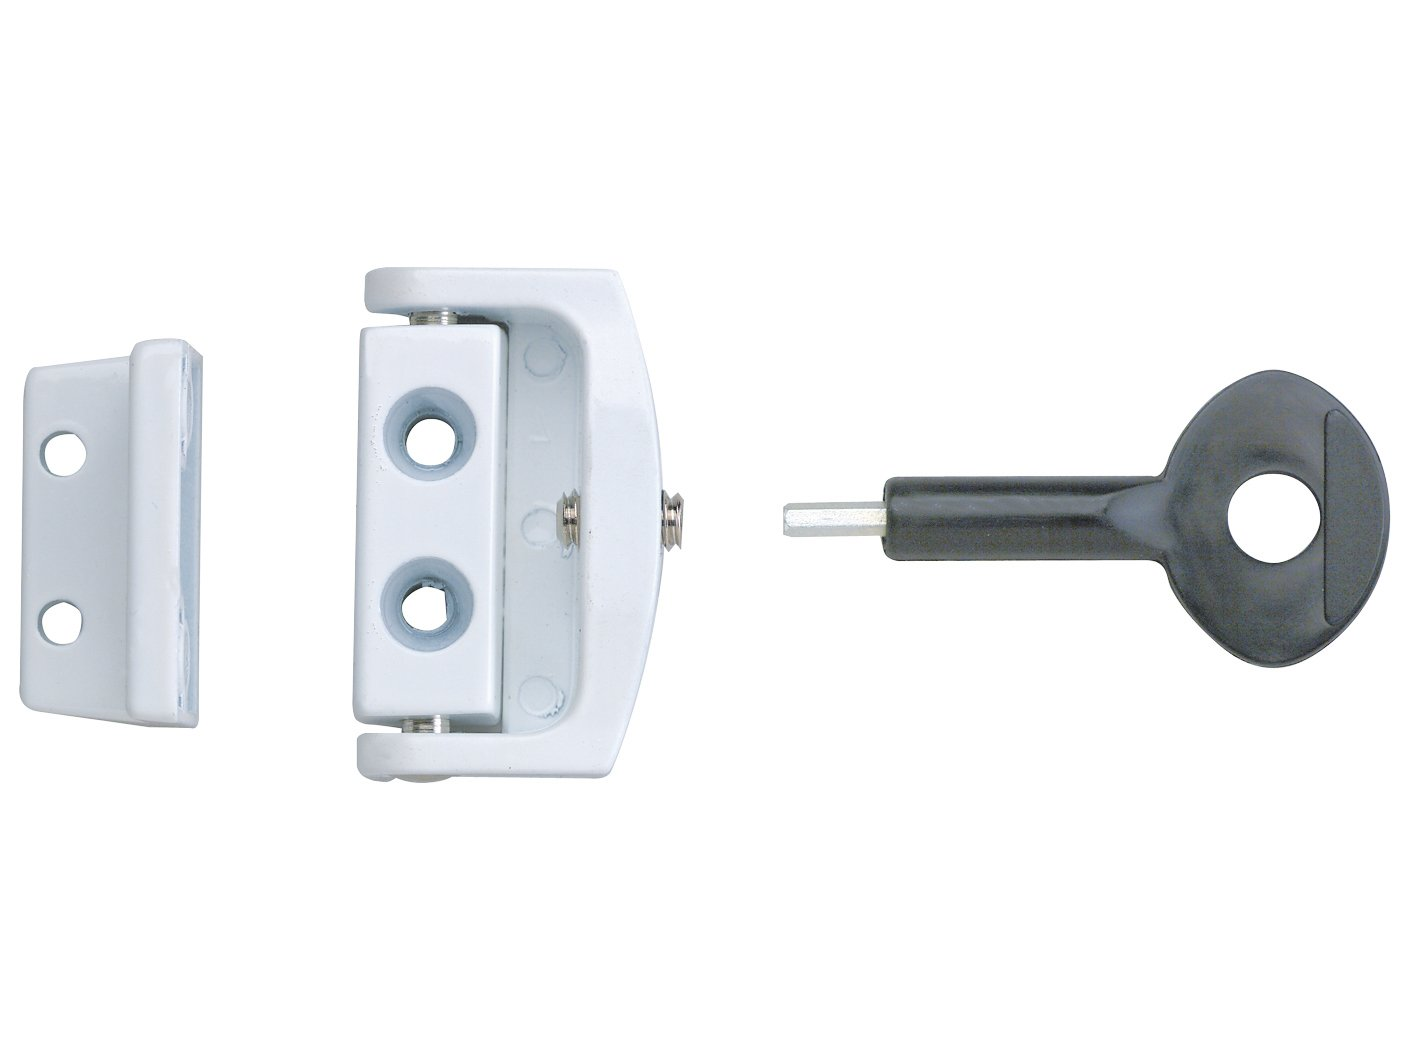 Yale Locks P113 Toggle Window Locks White (2 Pack) YALP2P113WE